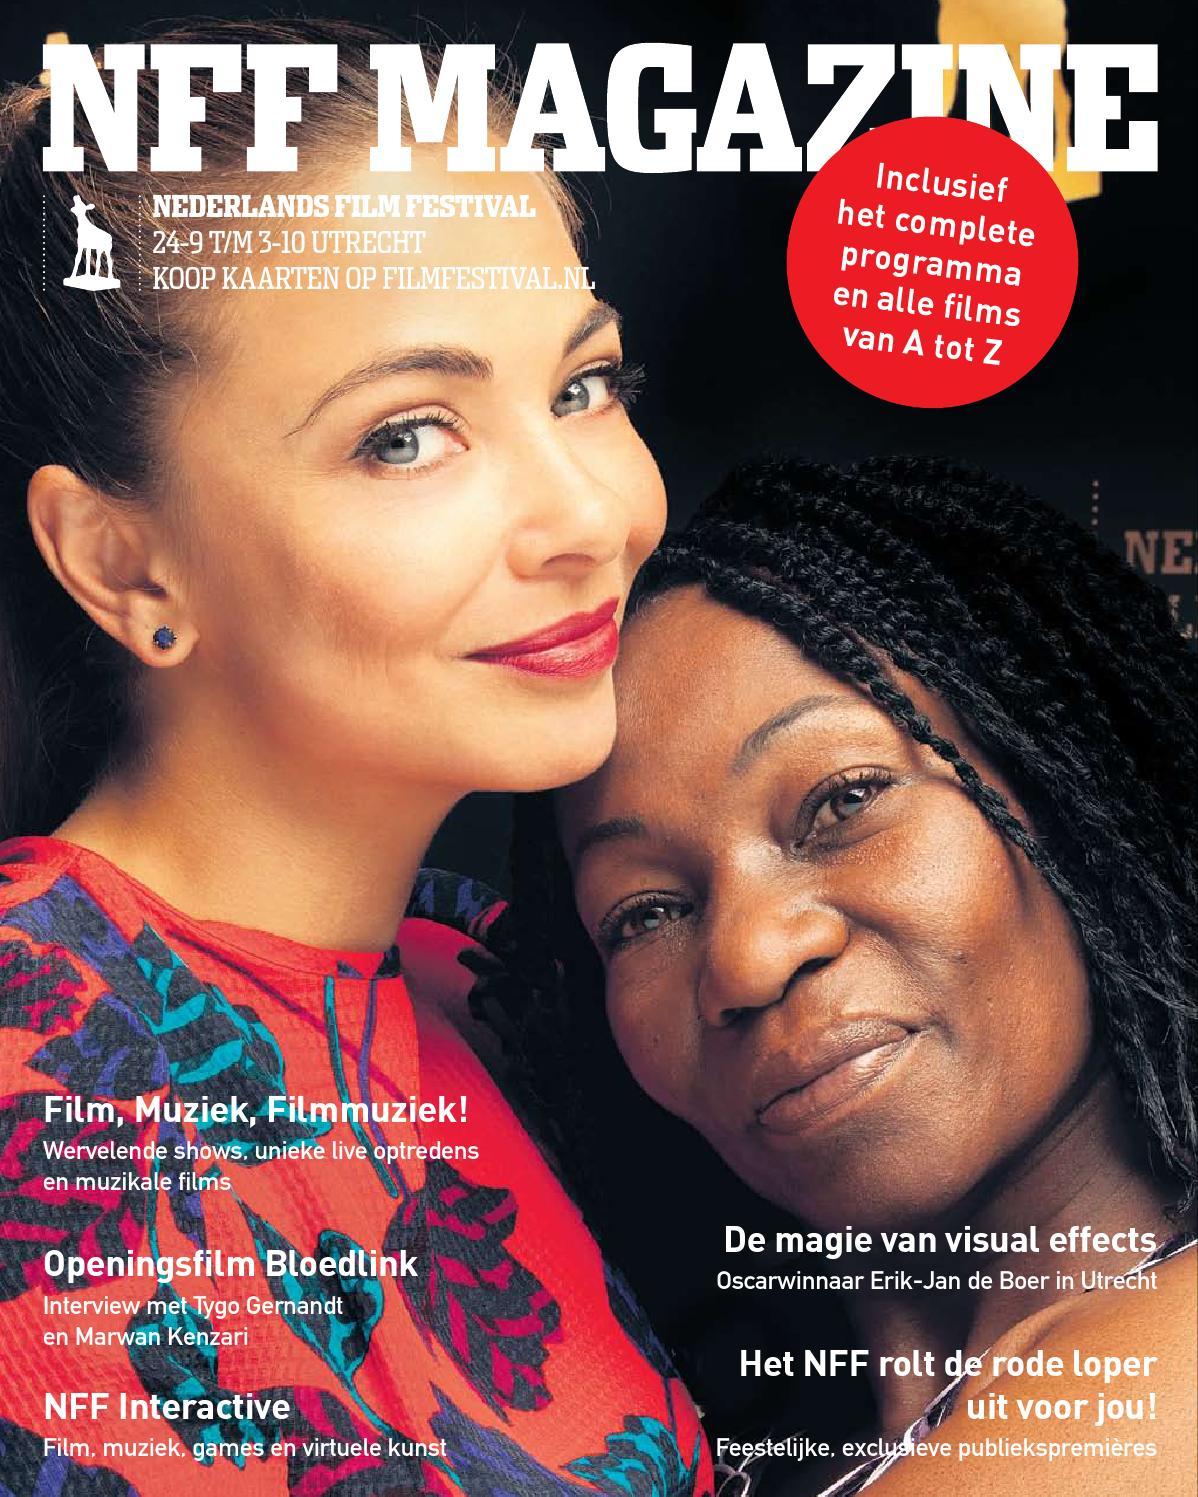 Nff magazine 2013 by nederlands film festival   issuu